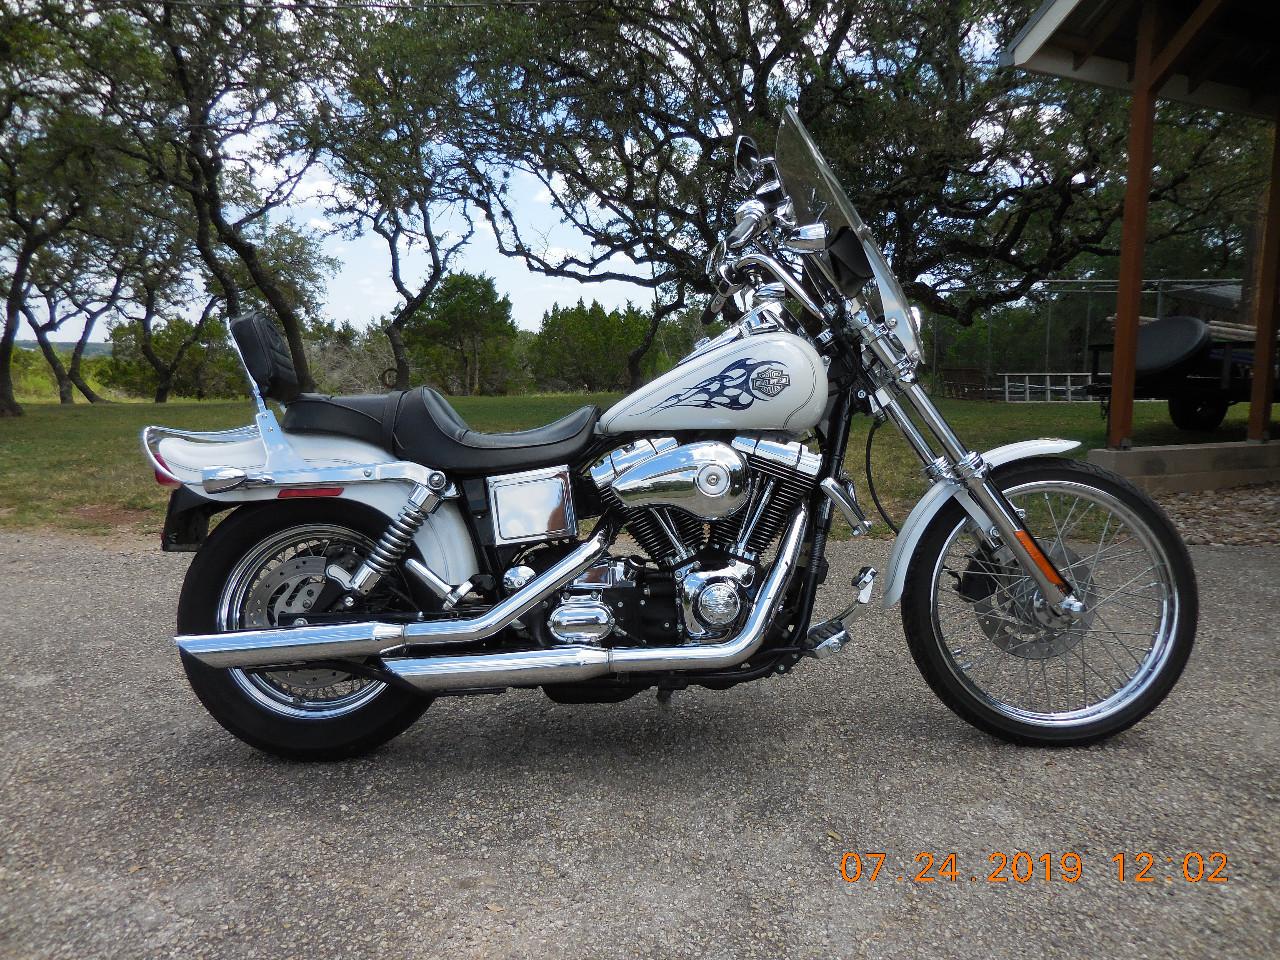 Austin, TX - Motorcycle,528553,1049211046,1049212410,1049212412